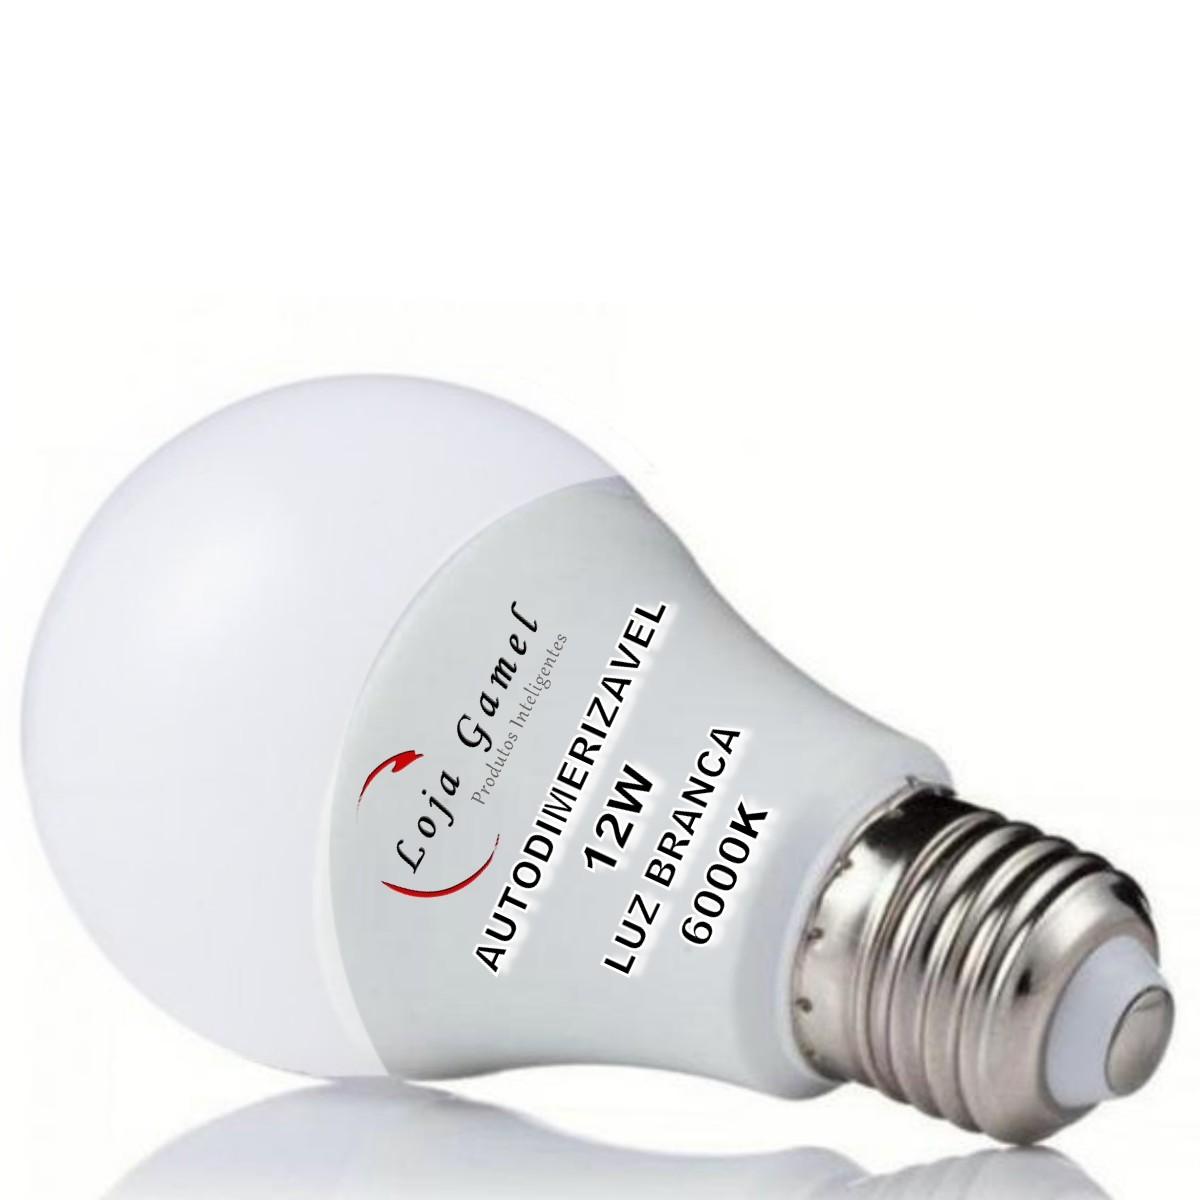 Foto2 - Lâmpada LED Bulbo Autodimerizável 12W Luz Branca 6000K Kit 12